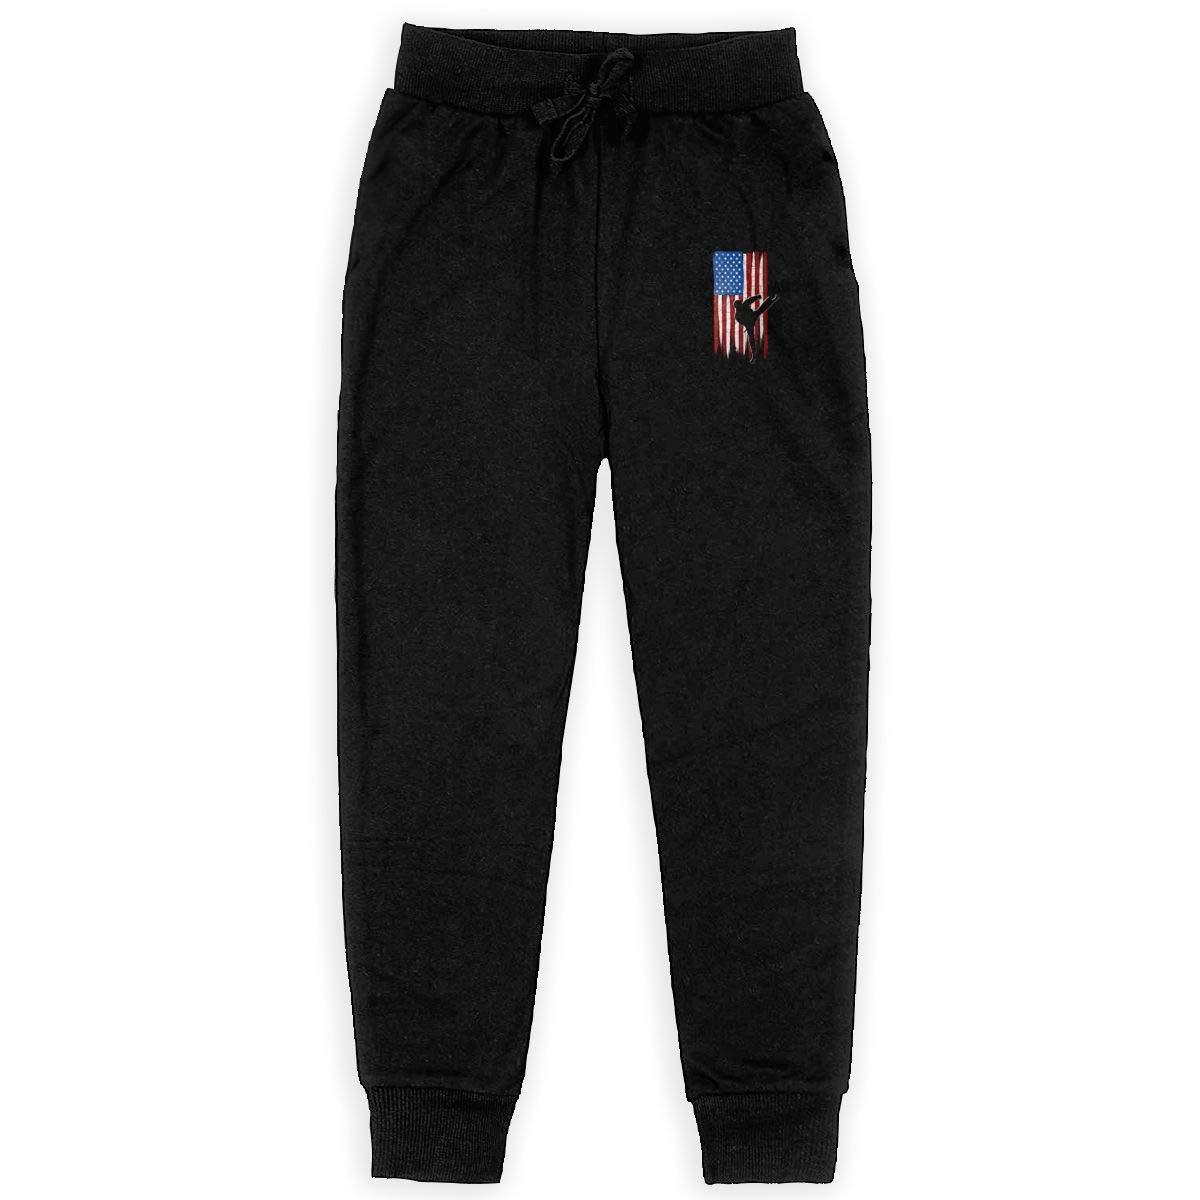 Qinf Boys Sweatpants 32536449/_162 Joggers Sport Training Pants Trousers Black